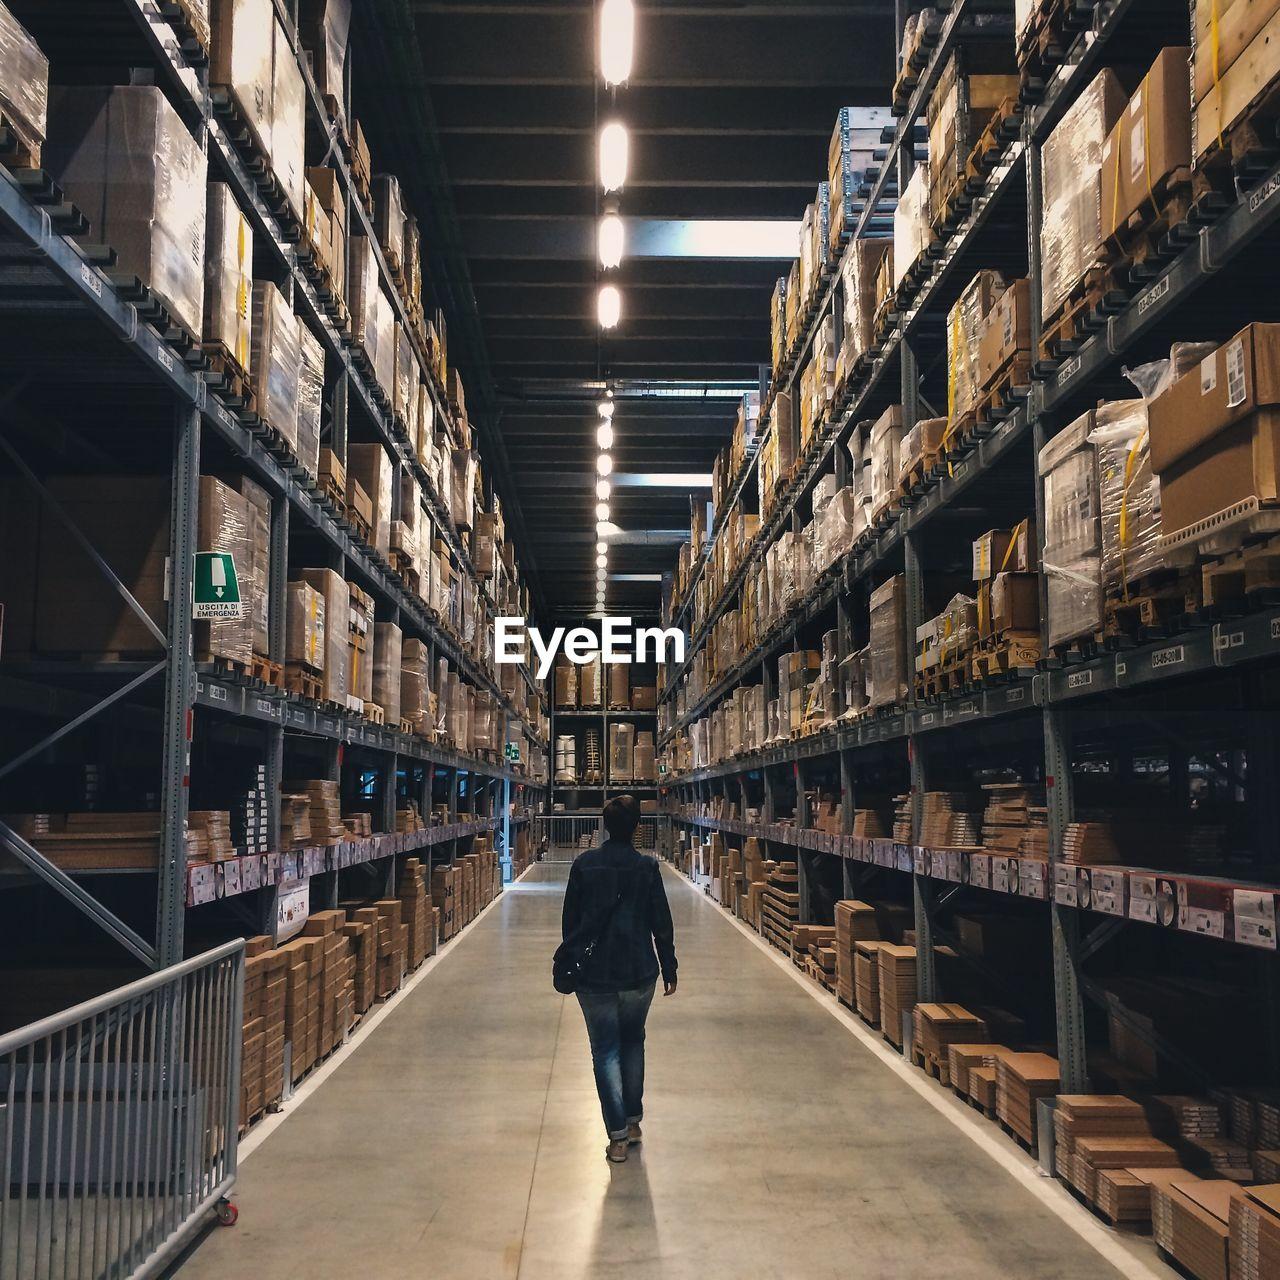 Stacked shelves on rack in warehouse